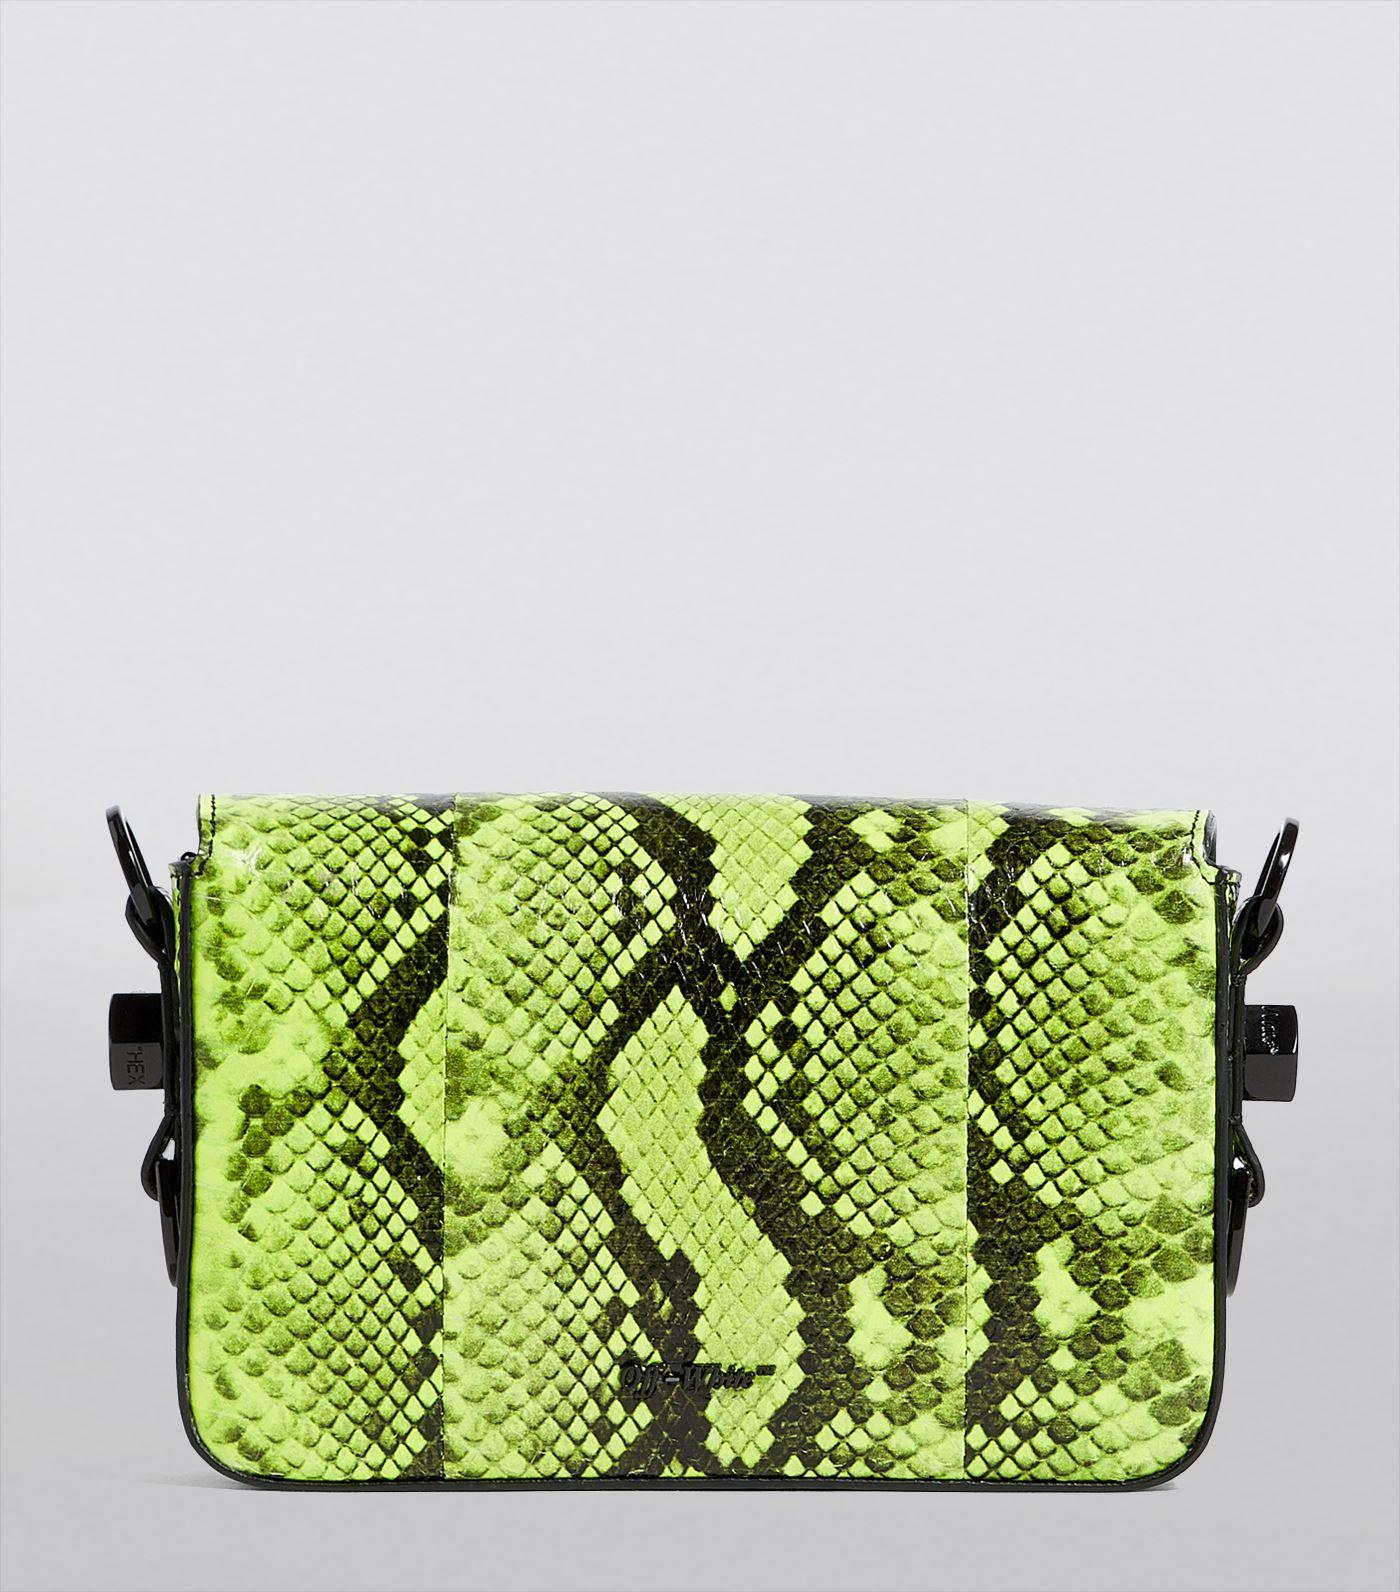 Mini Leather Binder Clip Bag